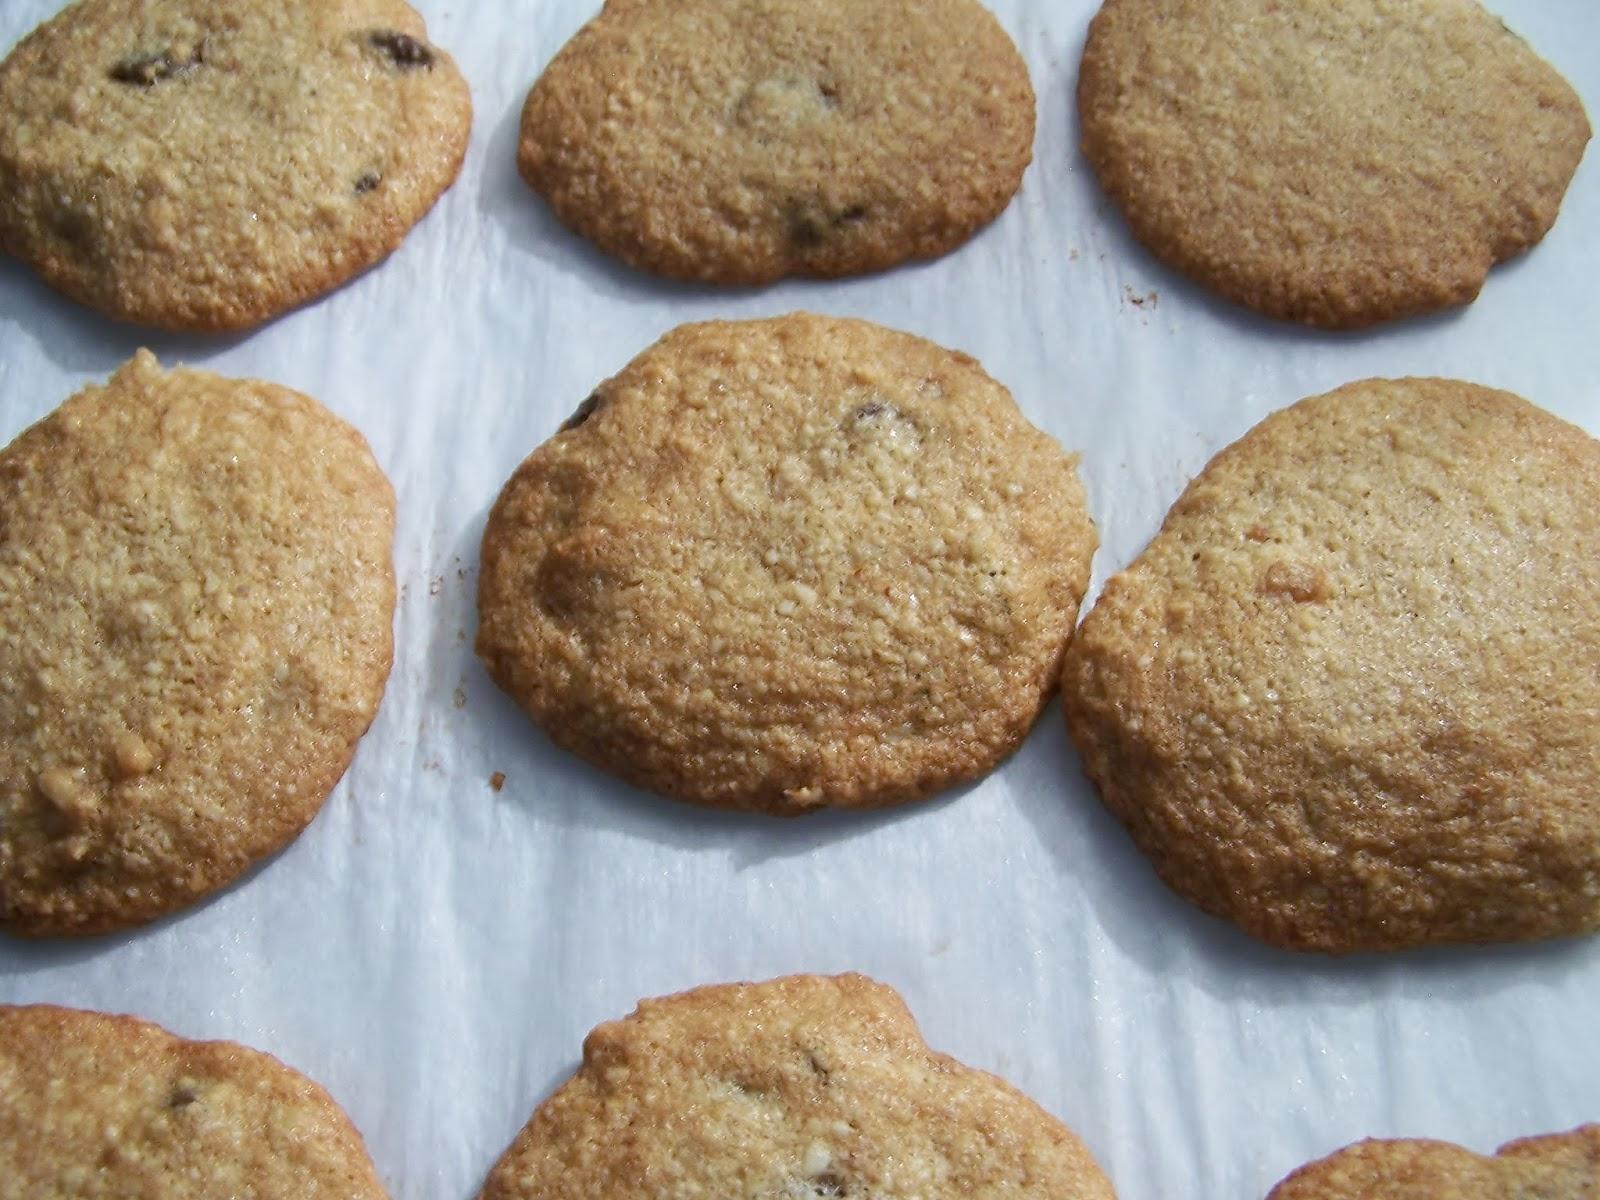 Chocolate Chip Paleo Cookies Calories